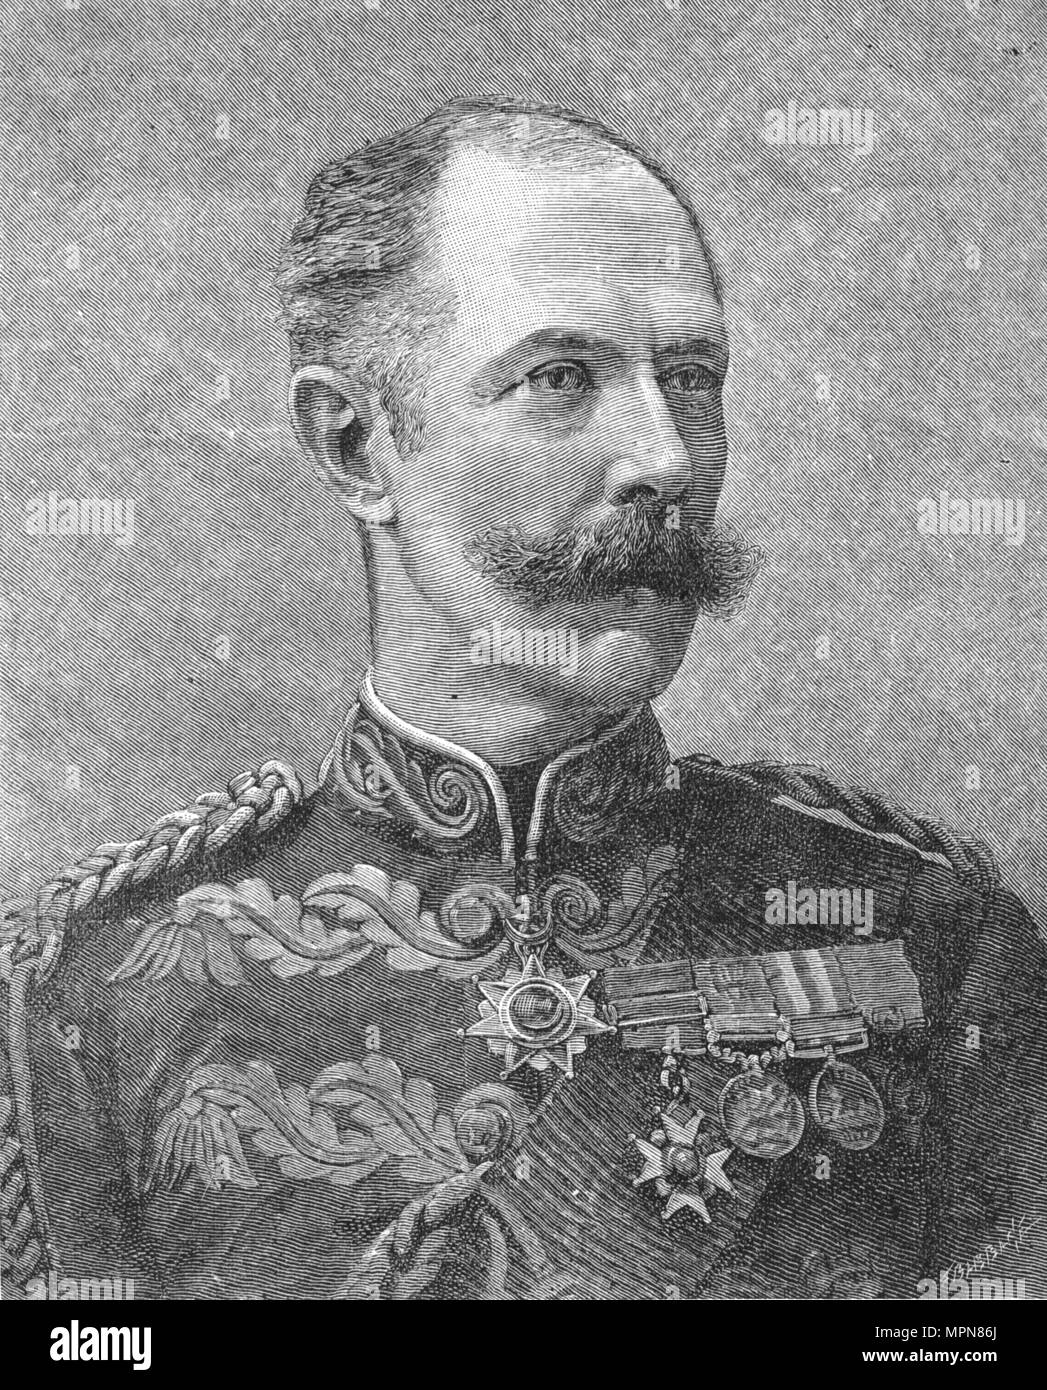 'General Sir Herbert Stewart', c1881-85. Artist: Unknown. - Stock Image